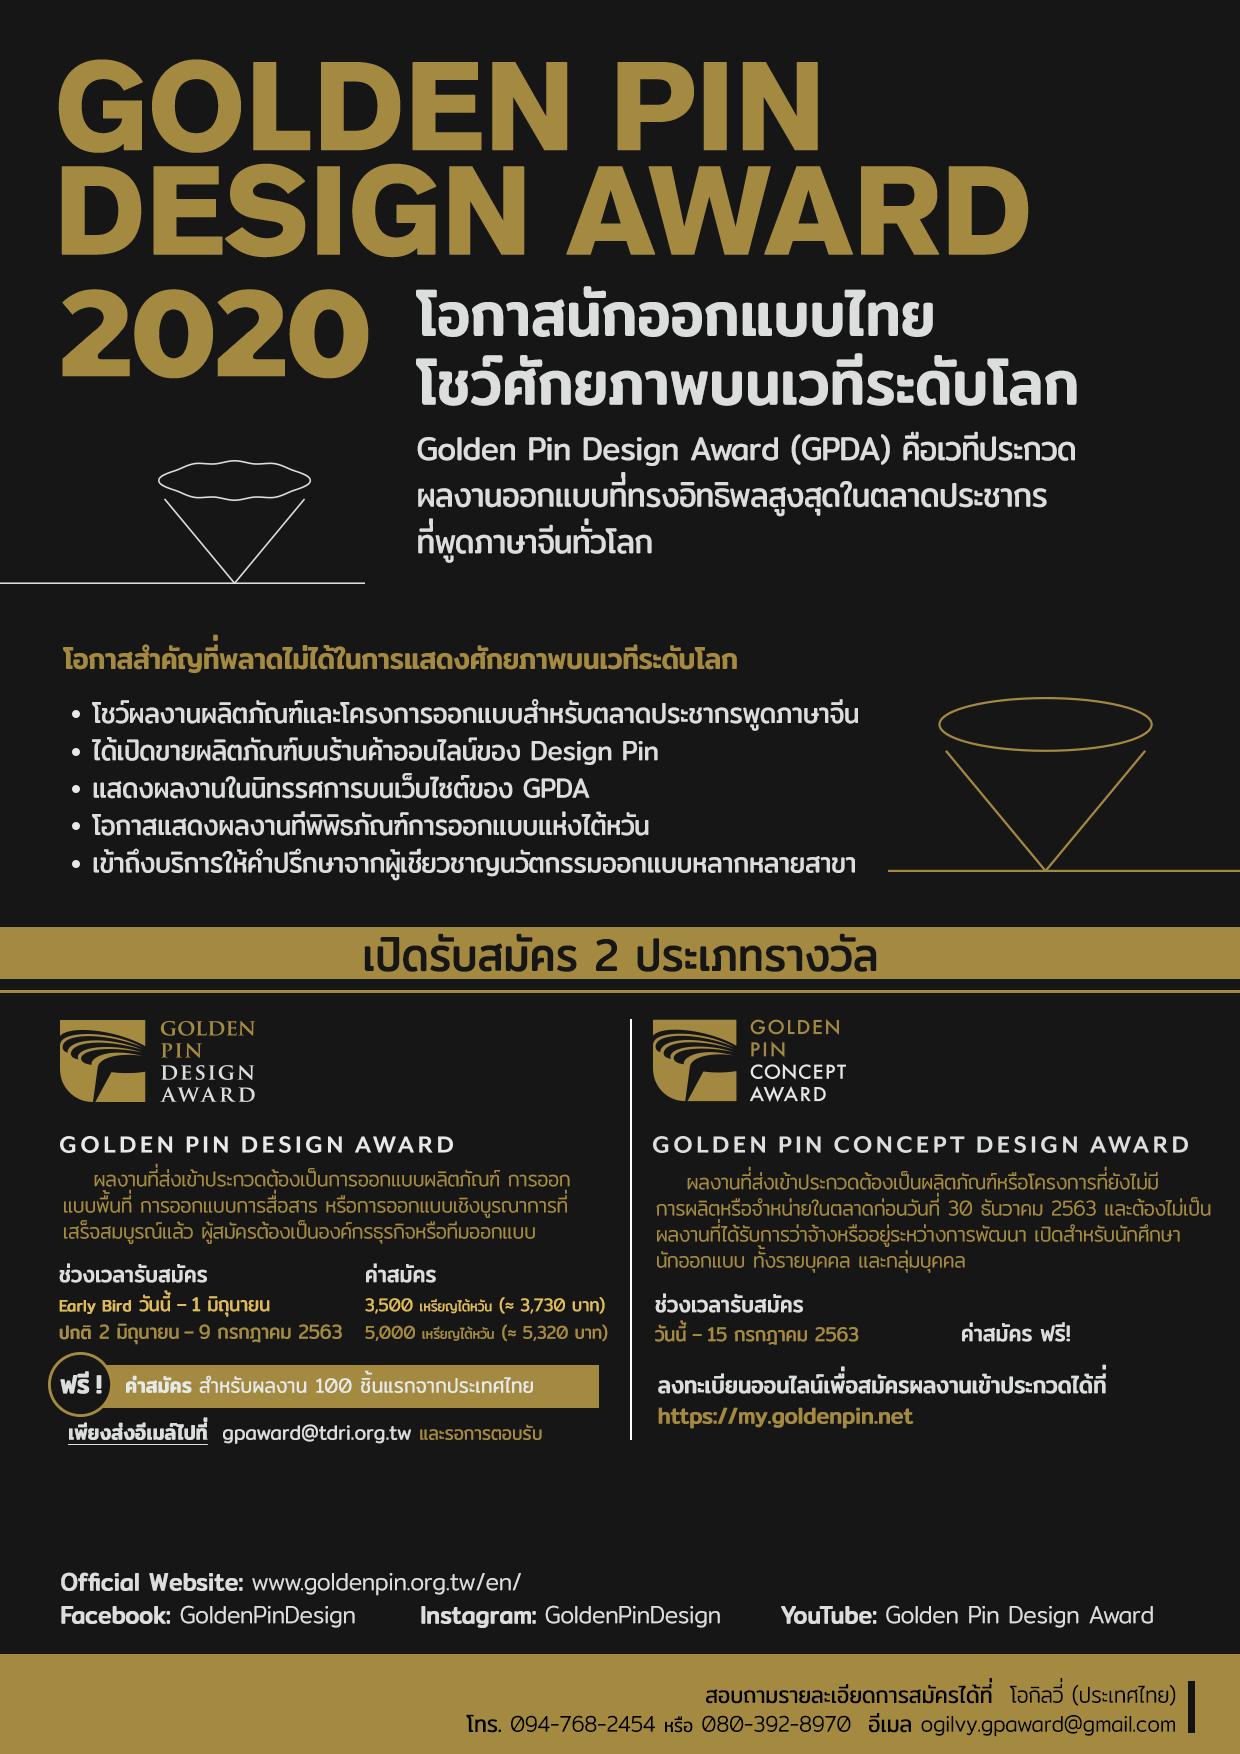 Golden Pin Design Award 2020